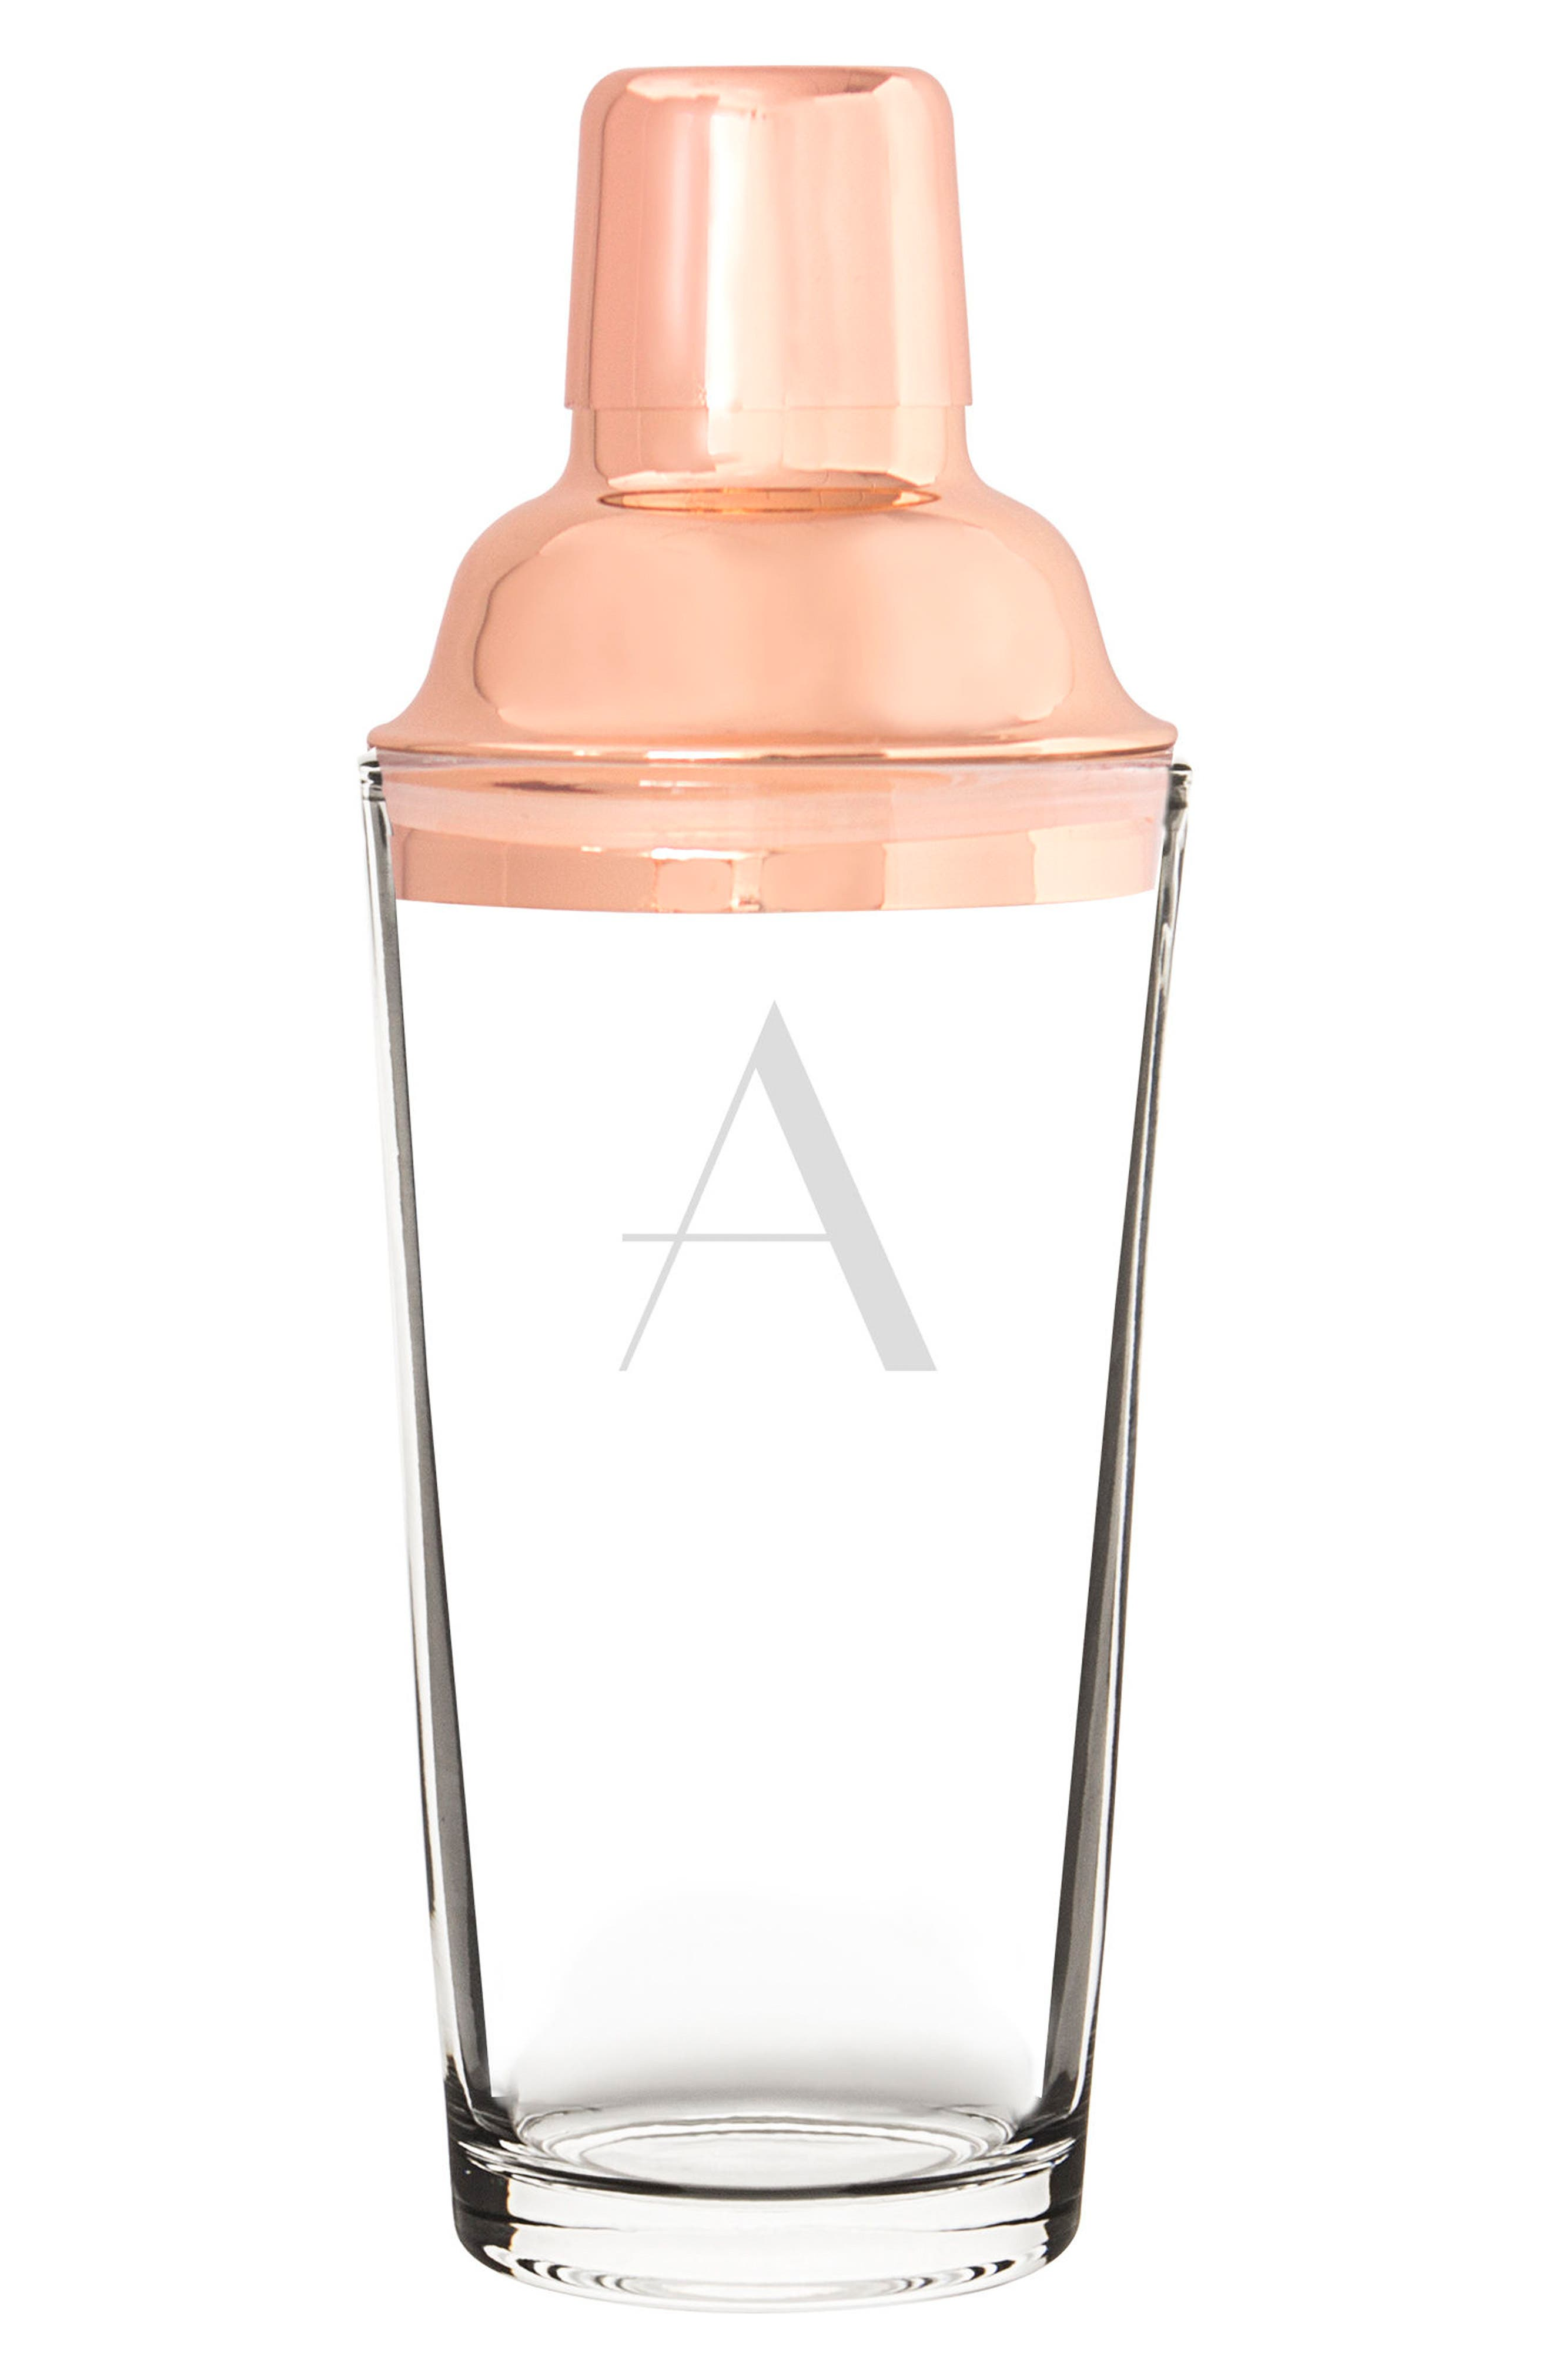 Monogram Coppertone Cocktail Shaker,                             Main thumbnail 2, color,